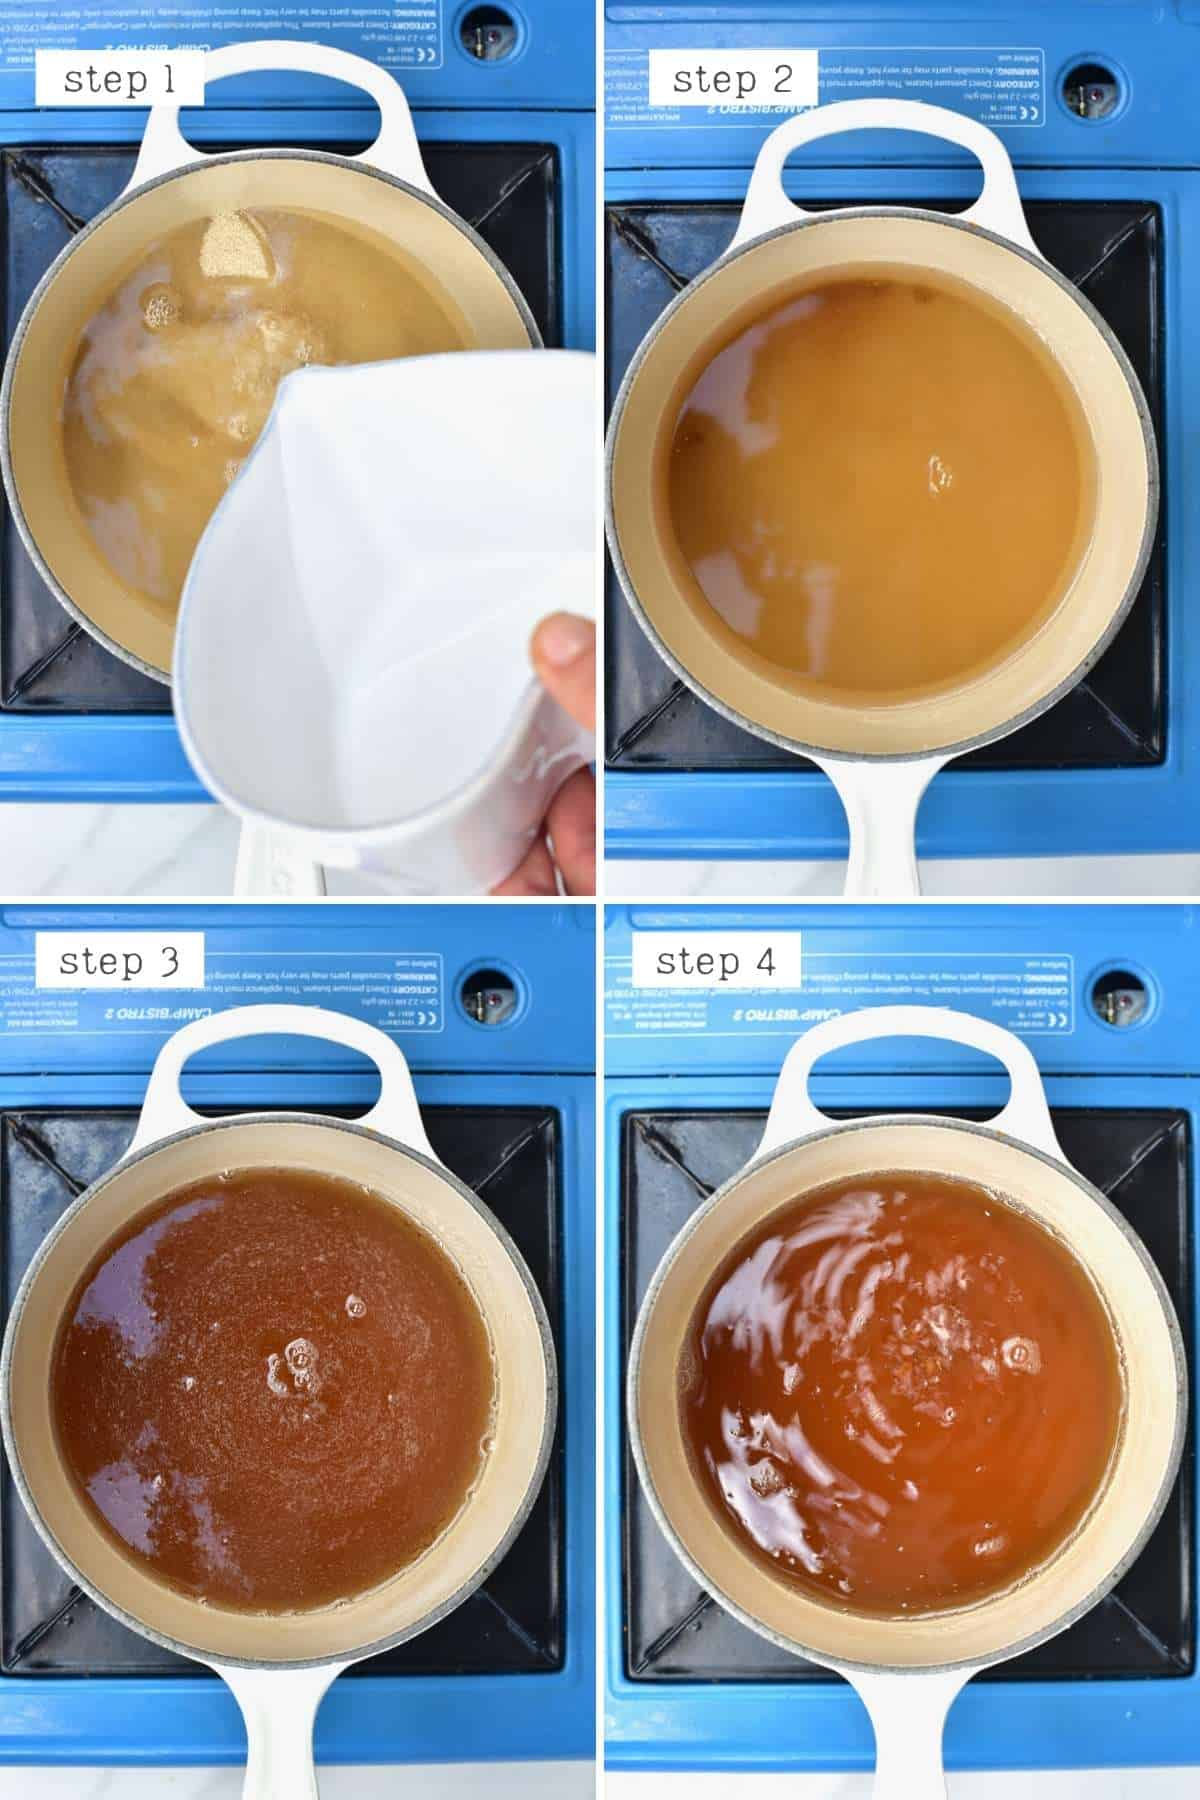 Steps for making sugar syrup